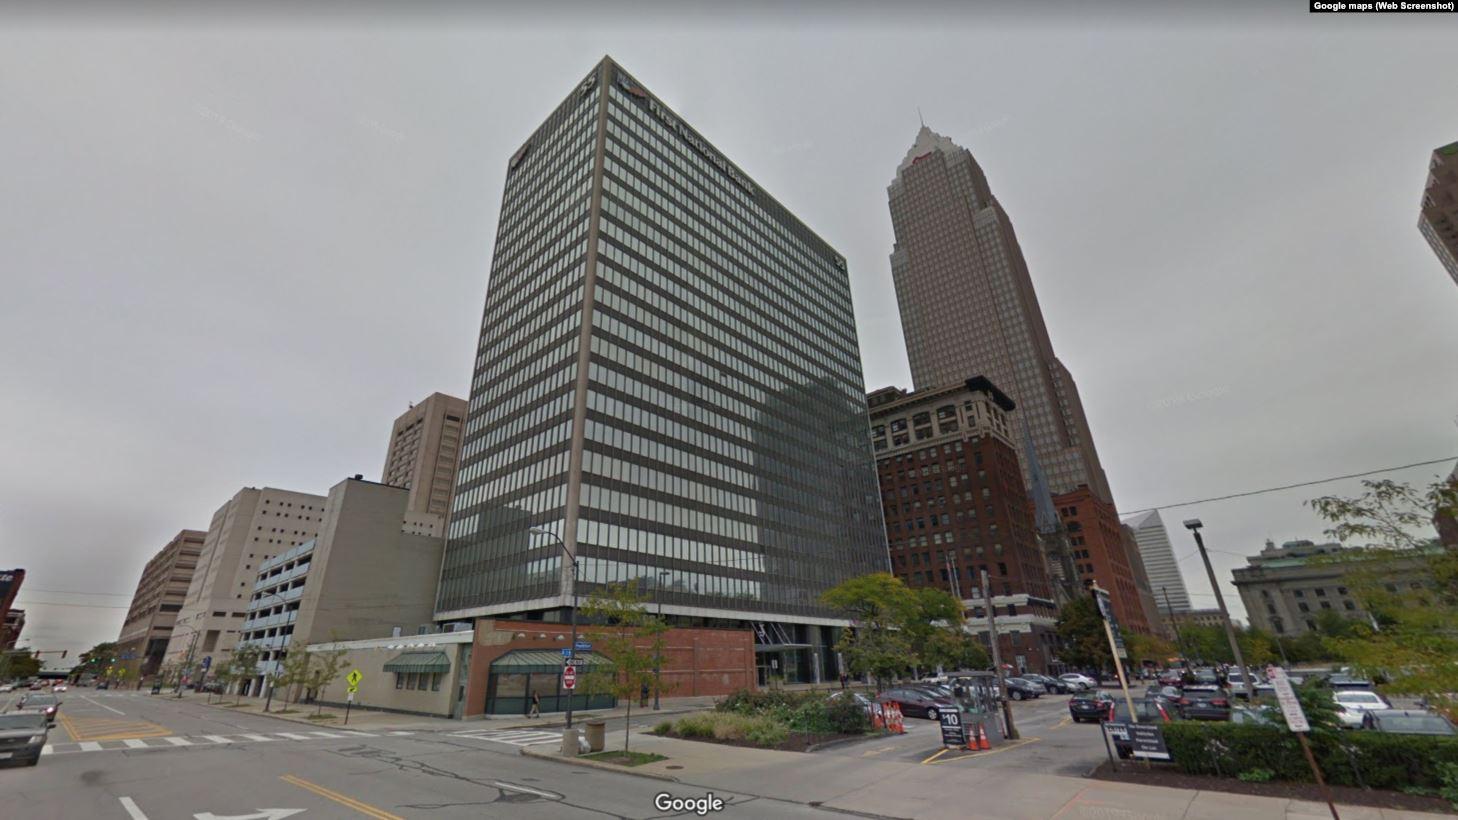 Public Square Building (Кливленд, Огайо, США) была приобретена за $34 миллиона